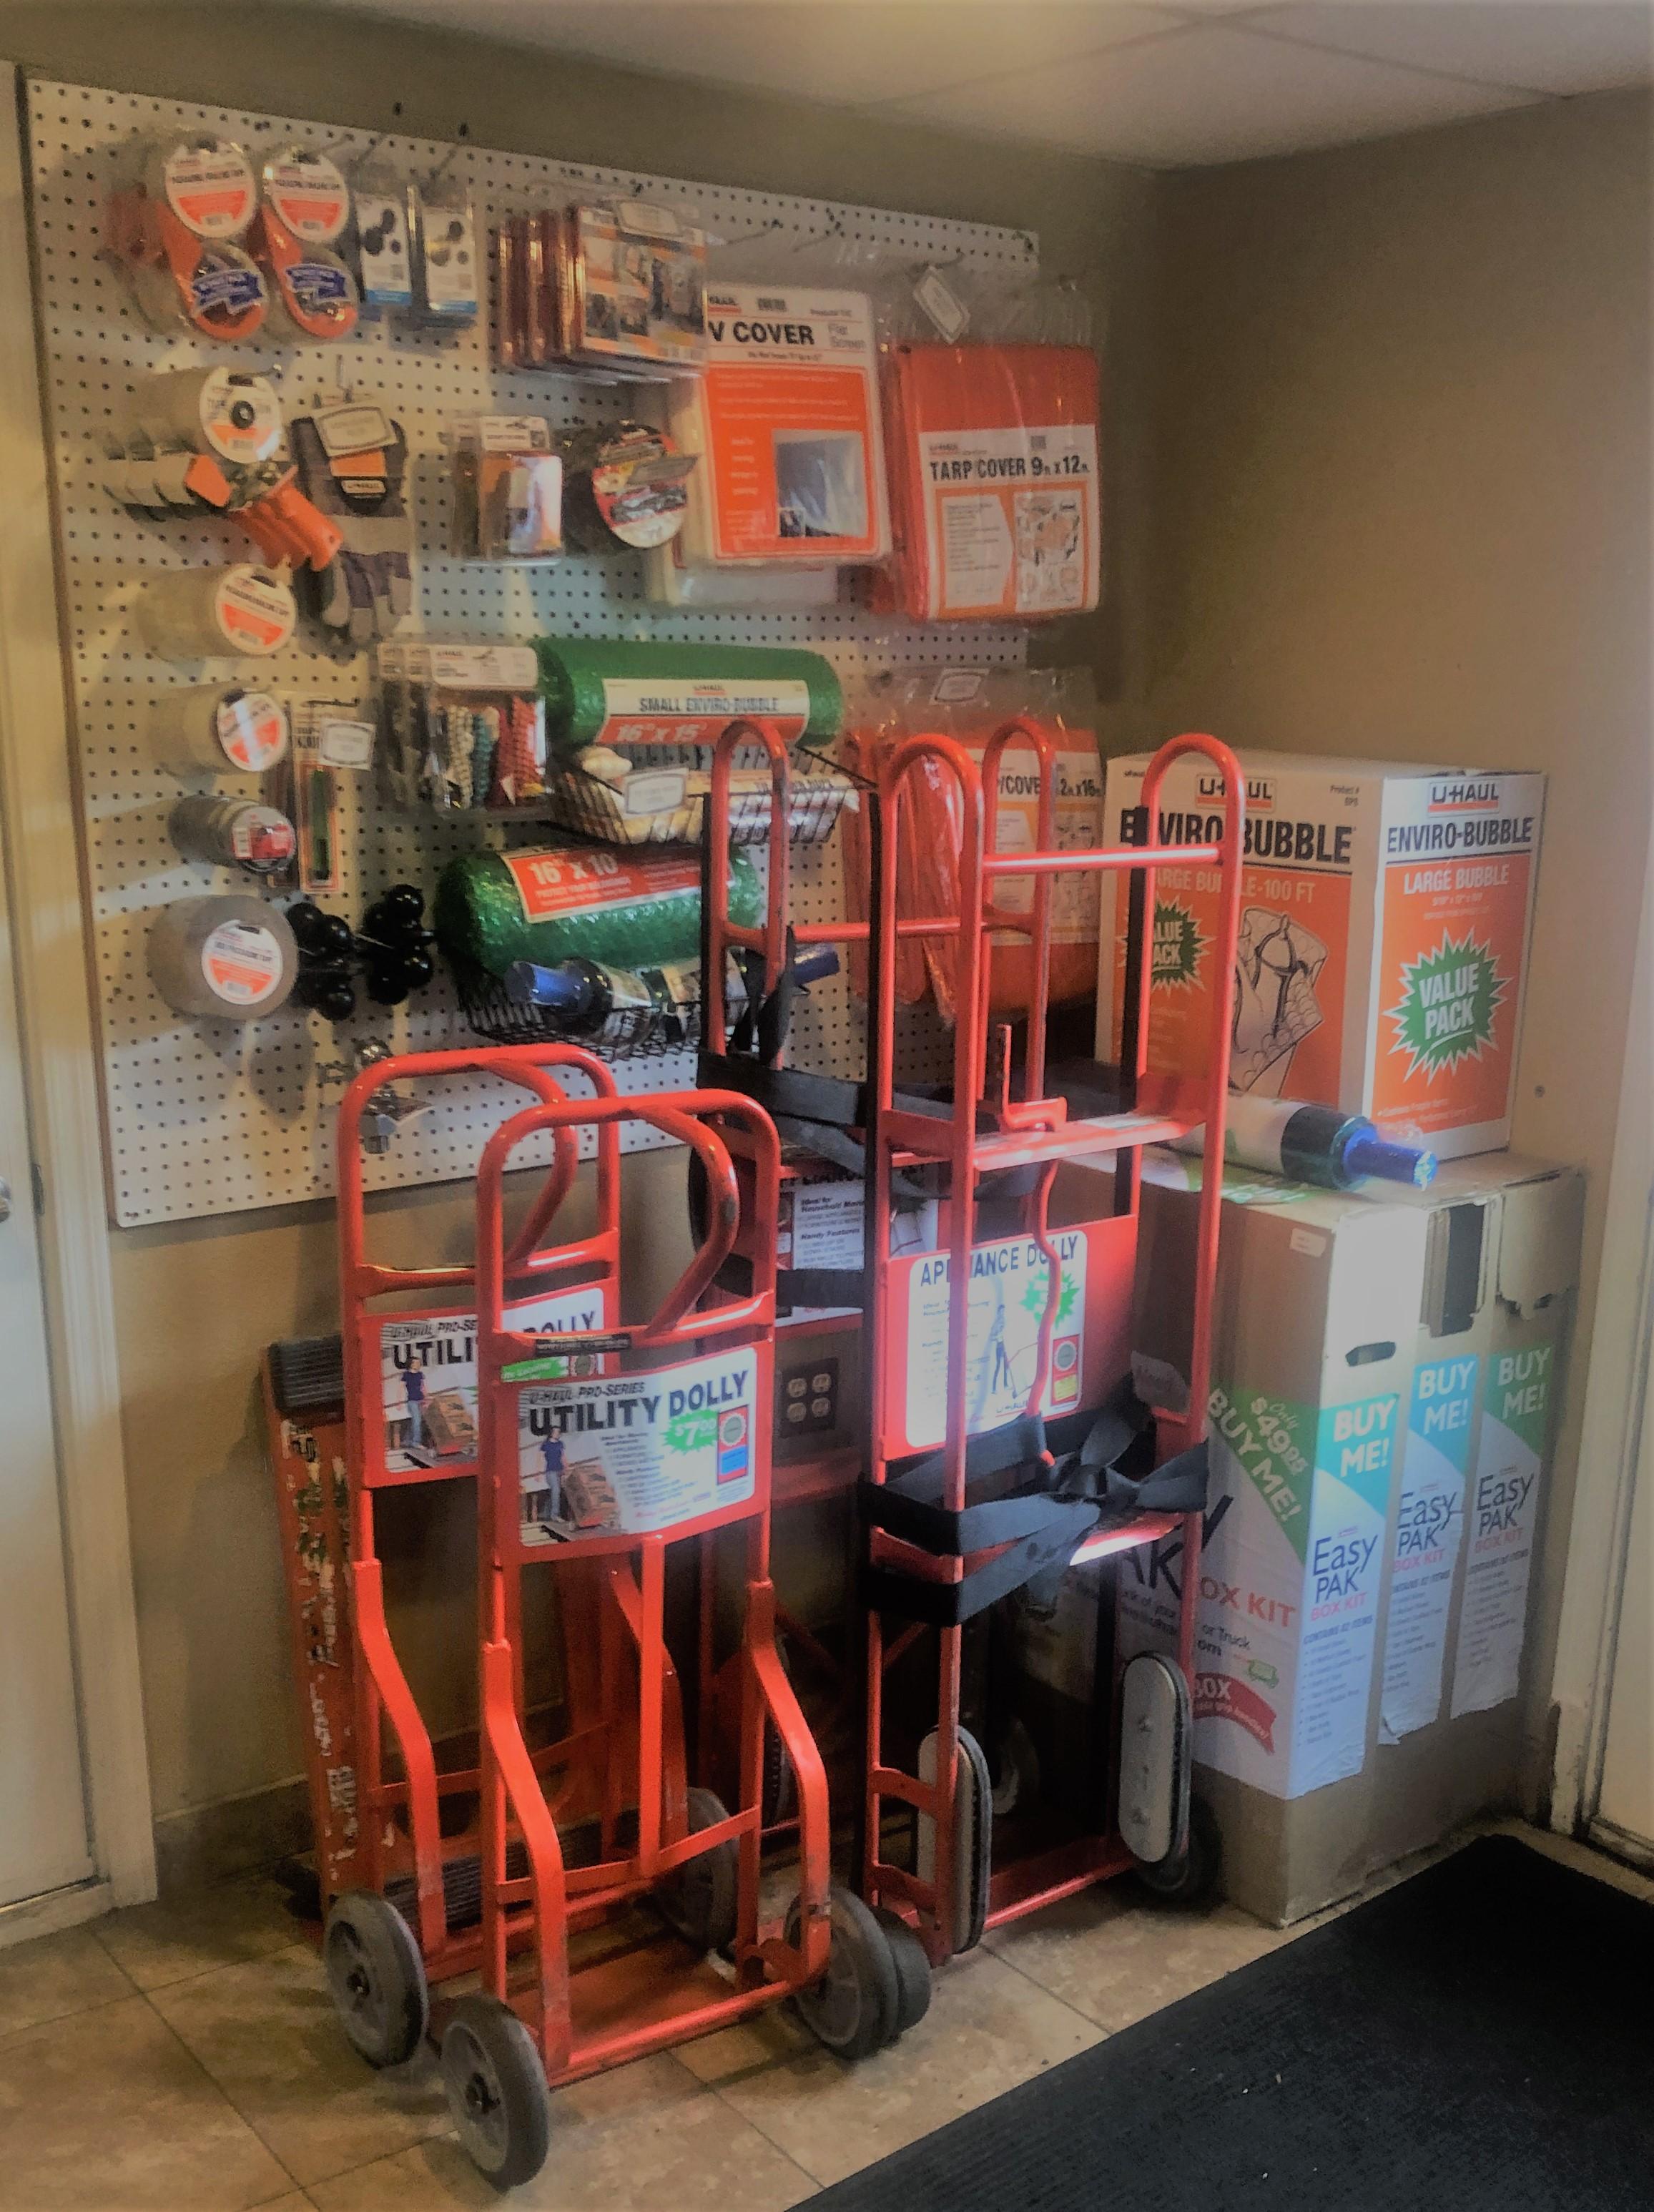 Prescott Valley RV & Self Storage